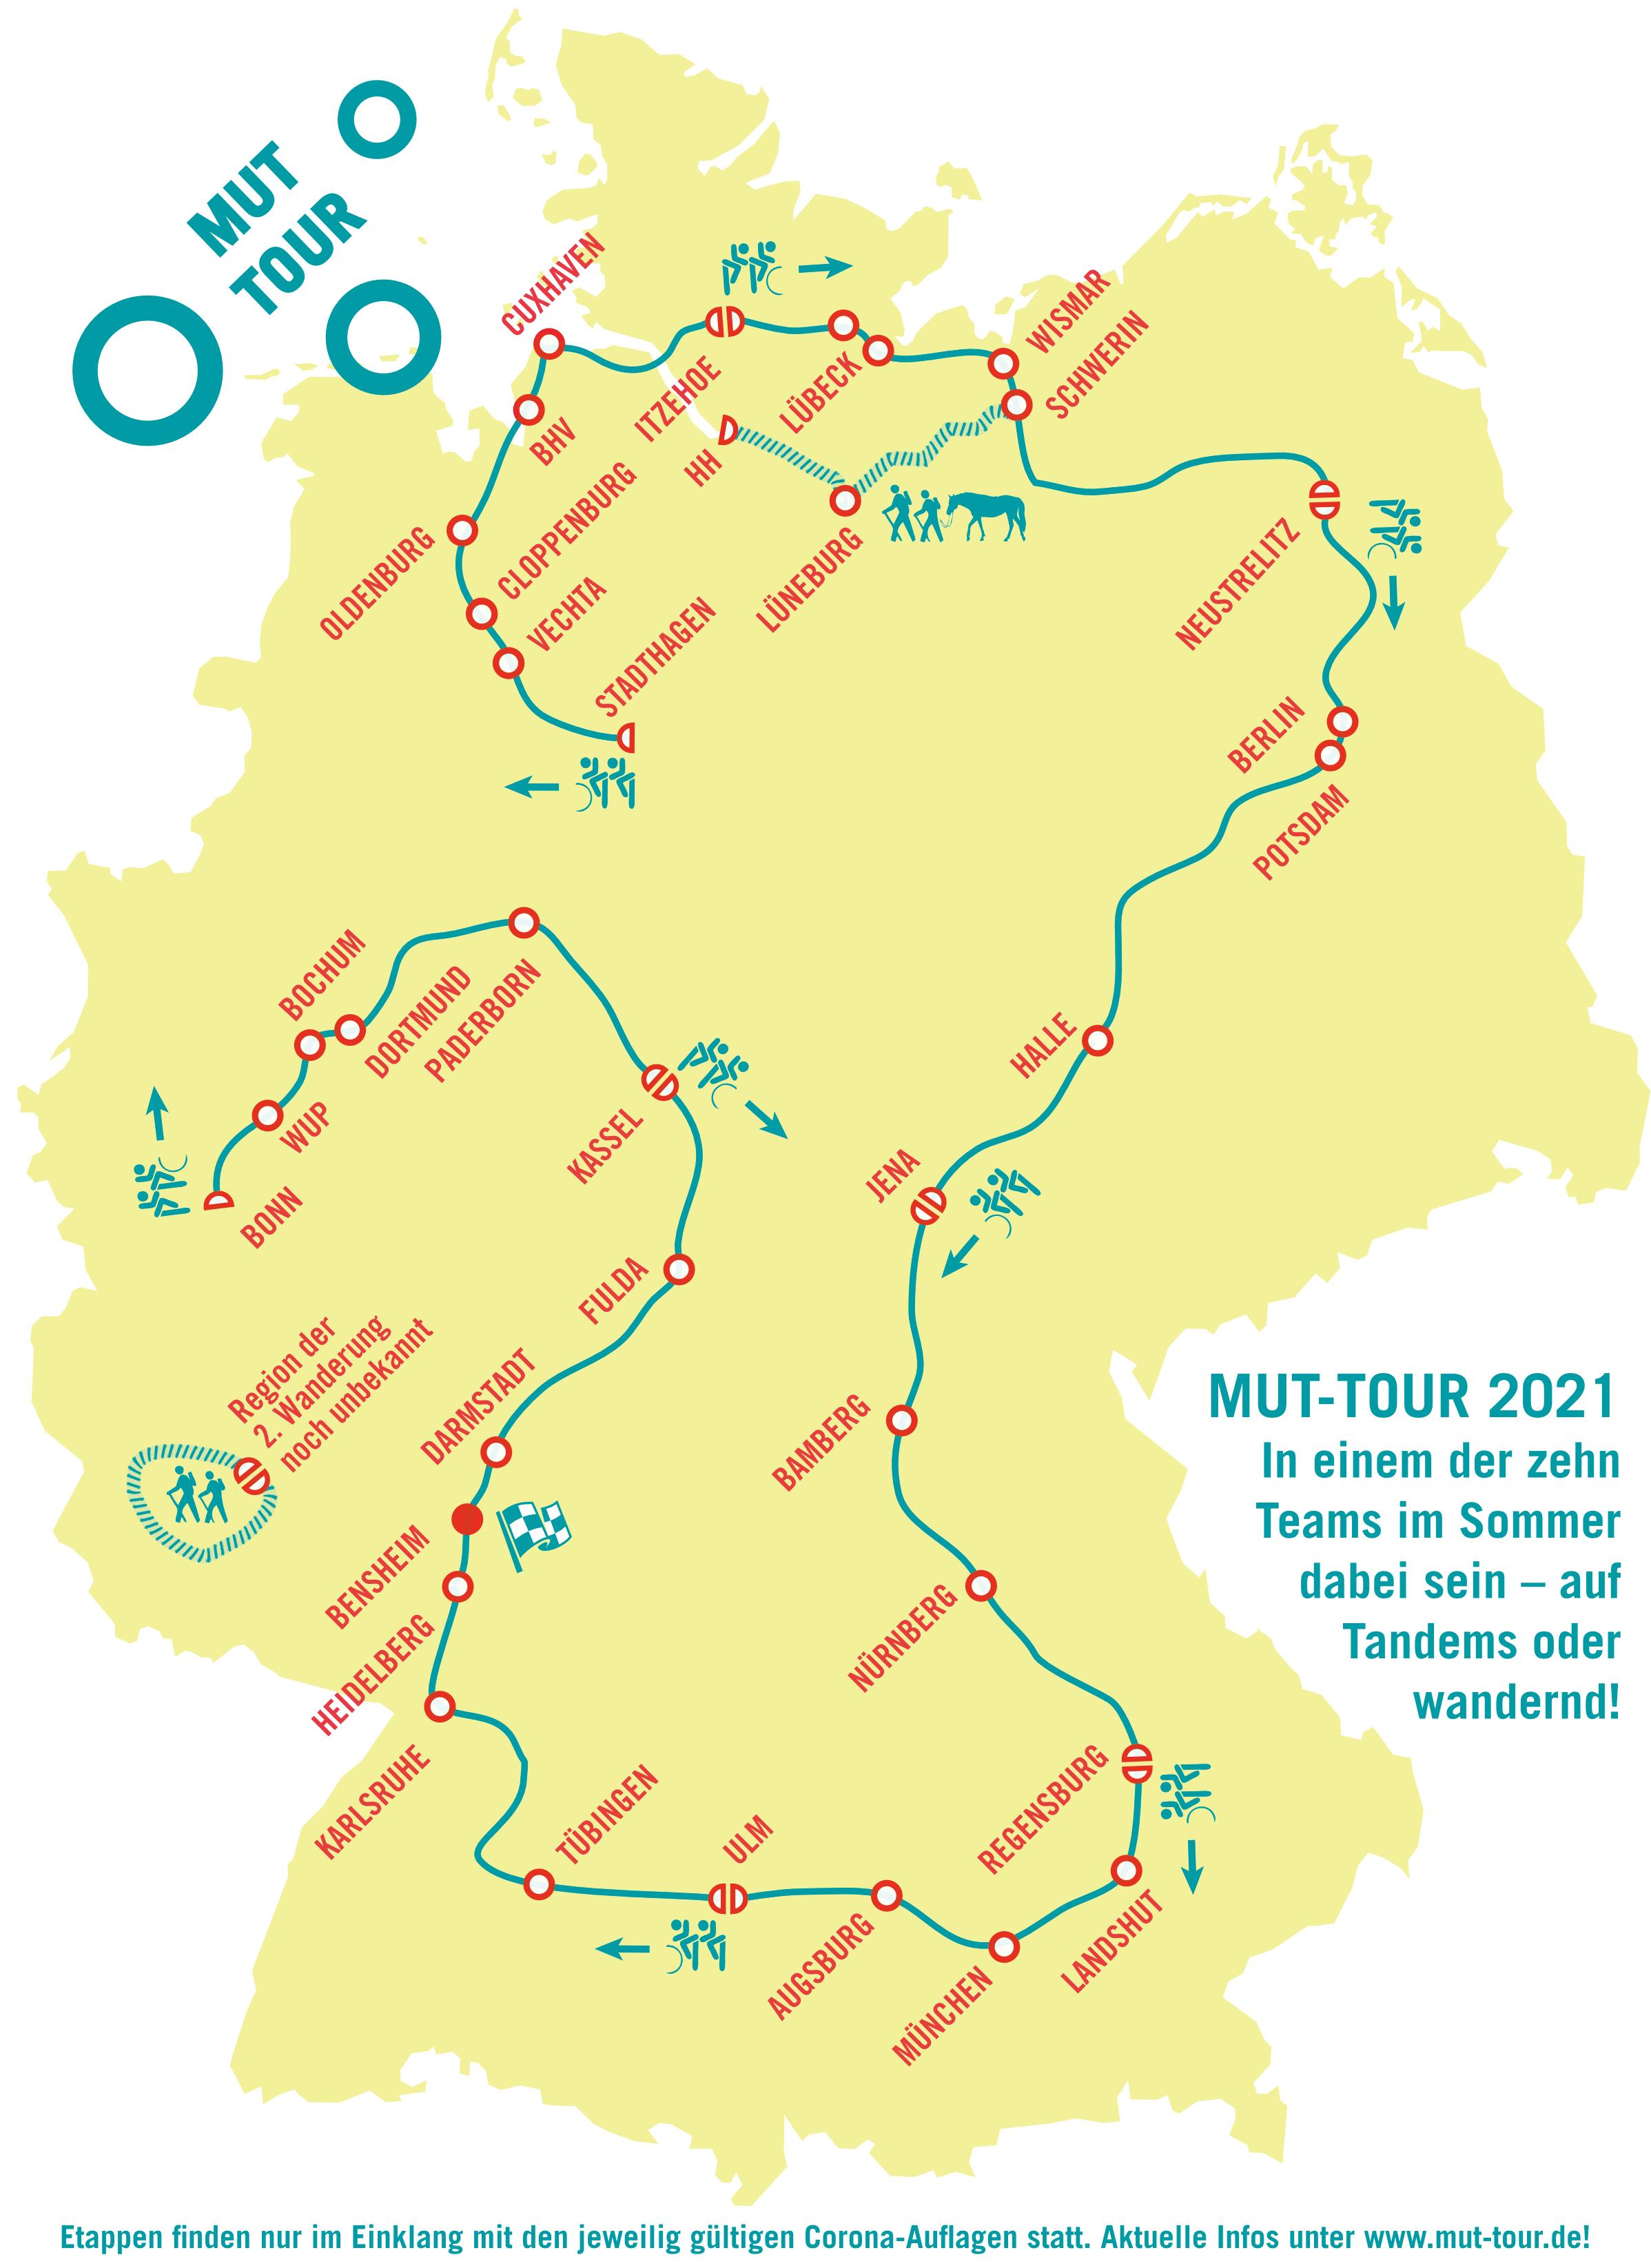 Etappen MUT-TOUR und MUT-WANDERN 2021